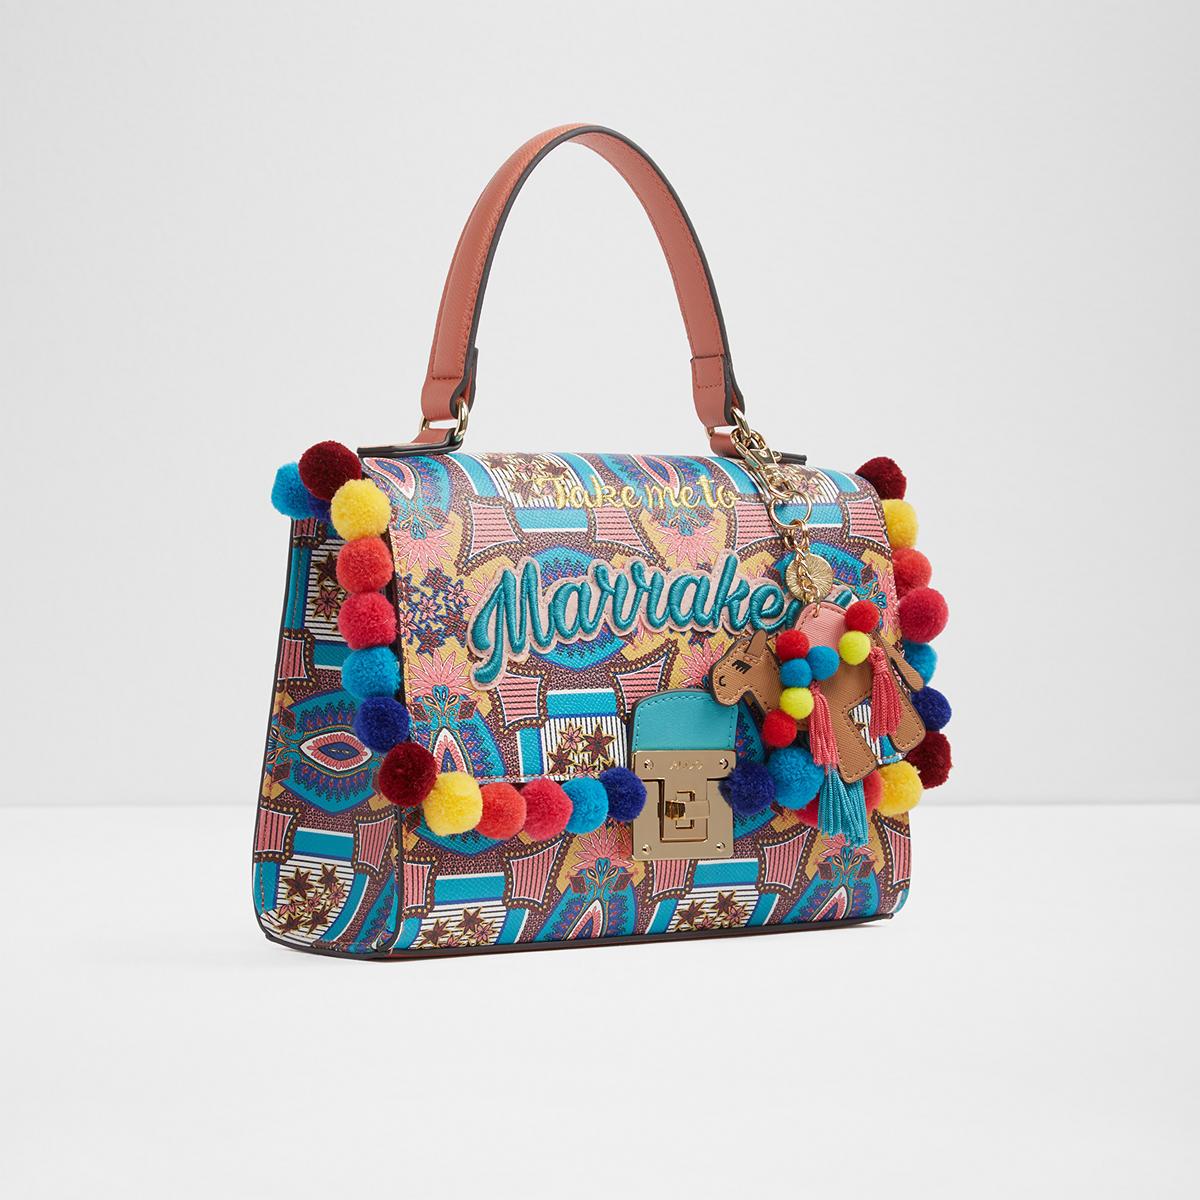 Aldo Canada Bags Promotions